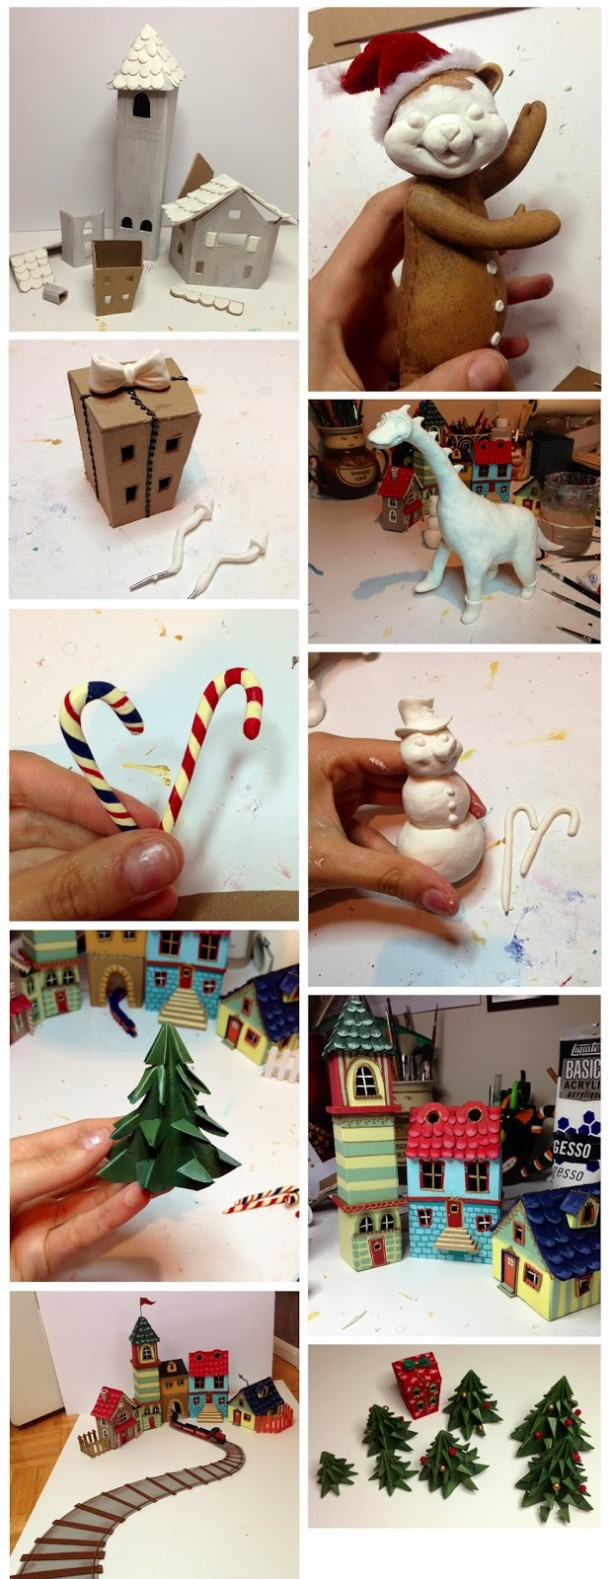 sculpting-process-toys